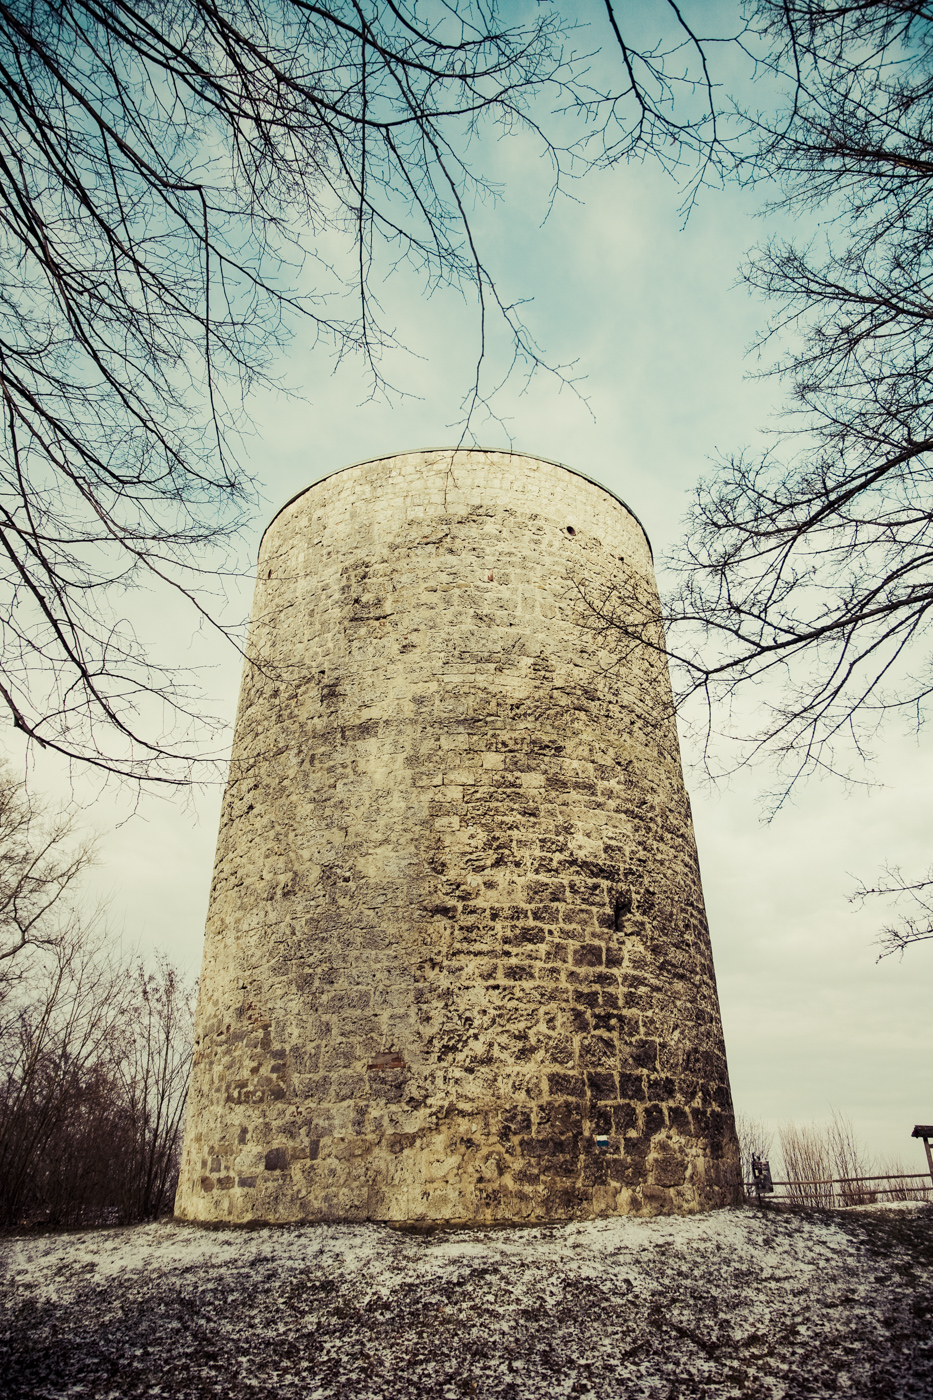 Magnusturm, Kasendorf, Kulmbacher Land